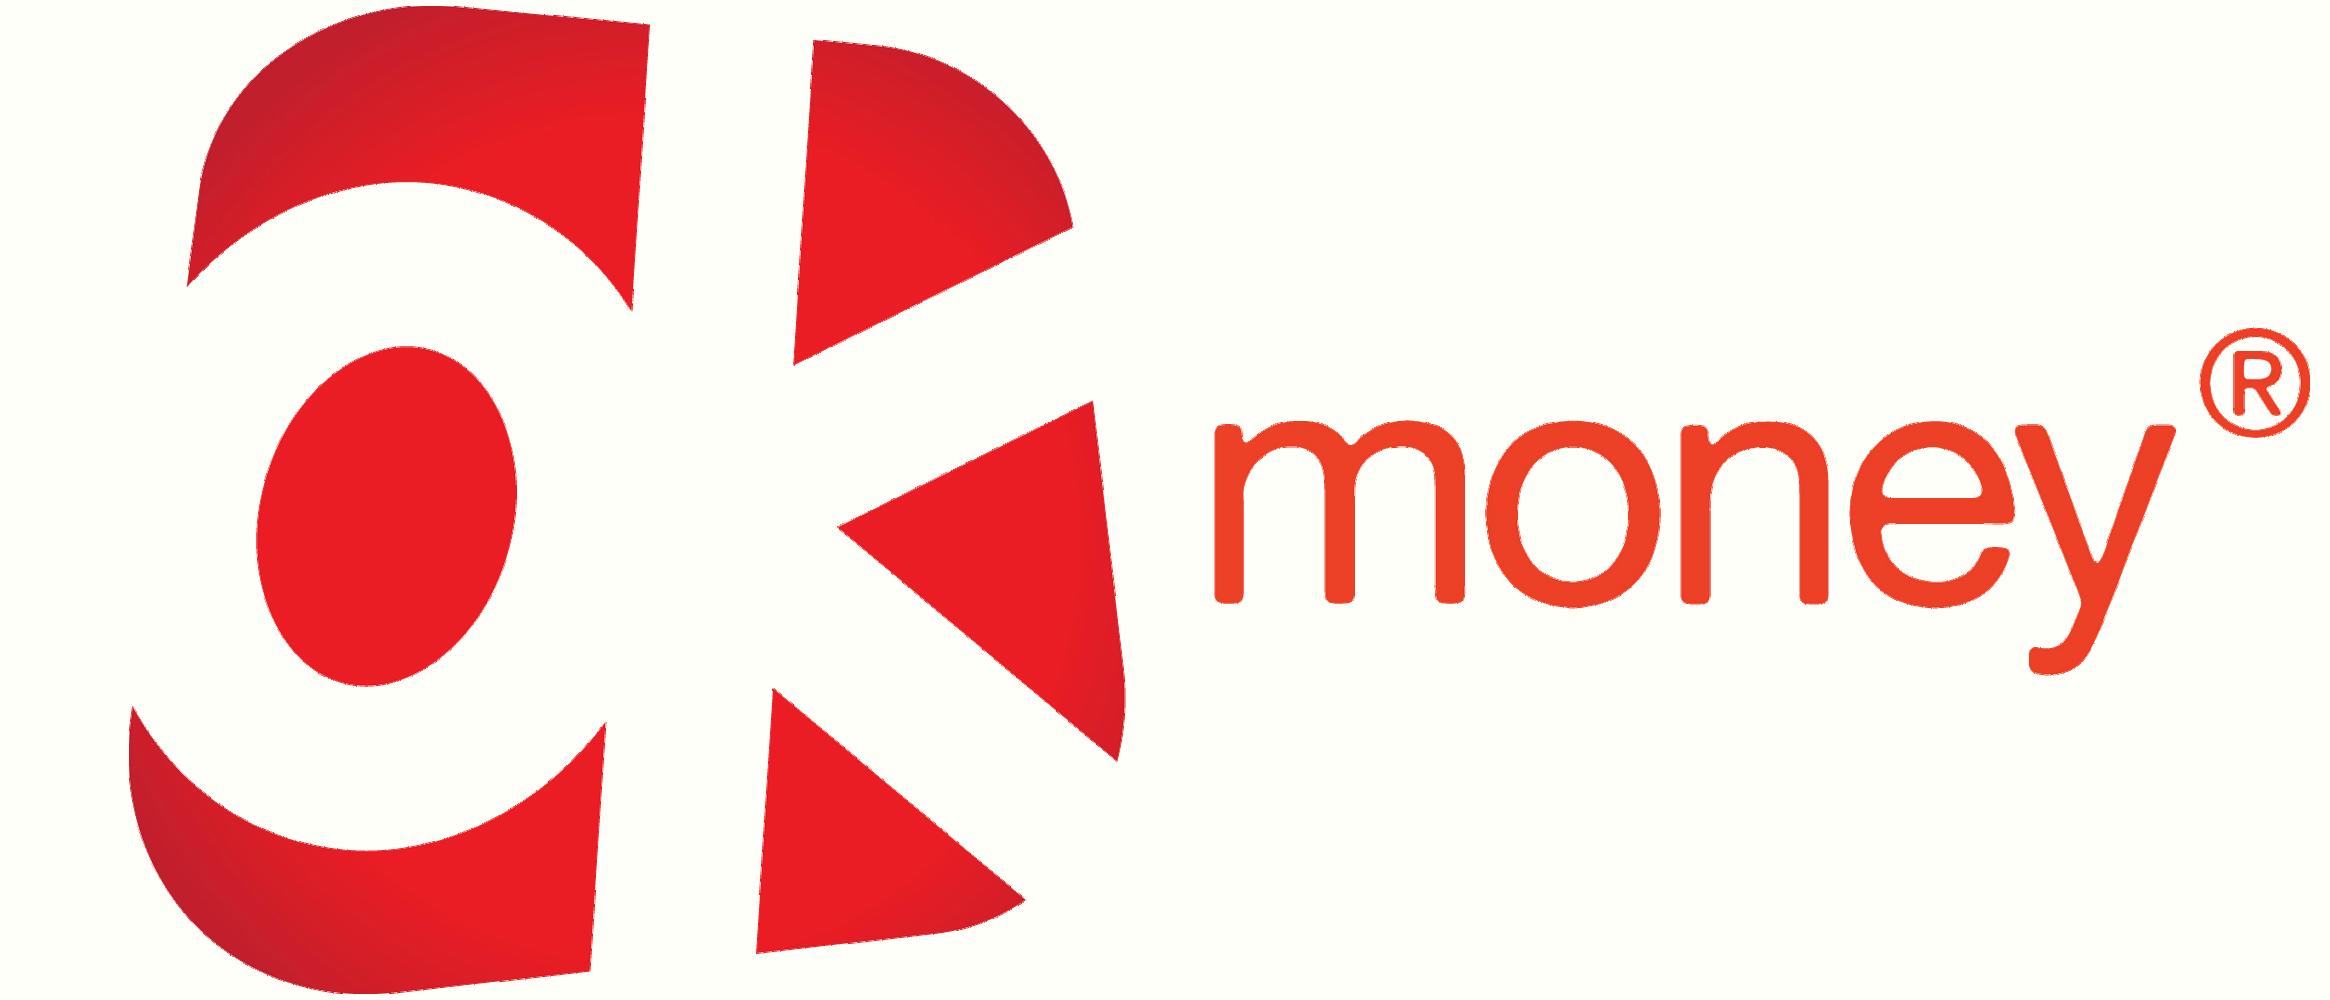 Risicum Capital lanserar lånetjänsten OK Money